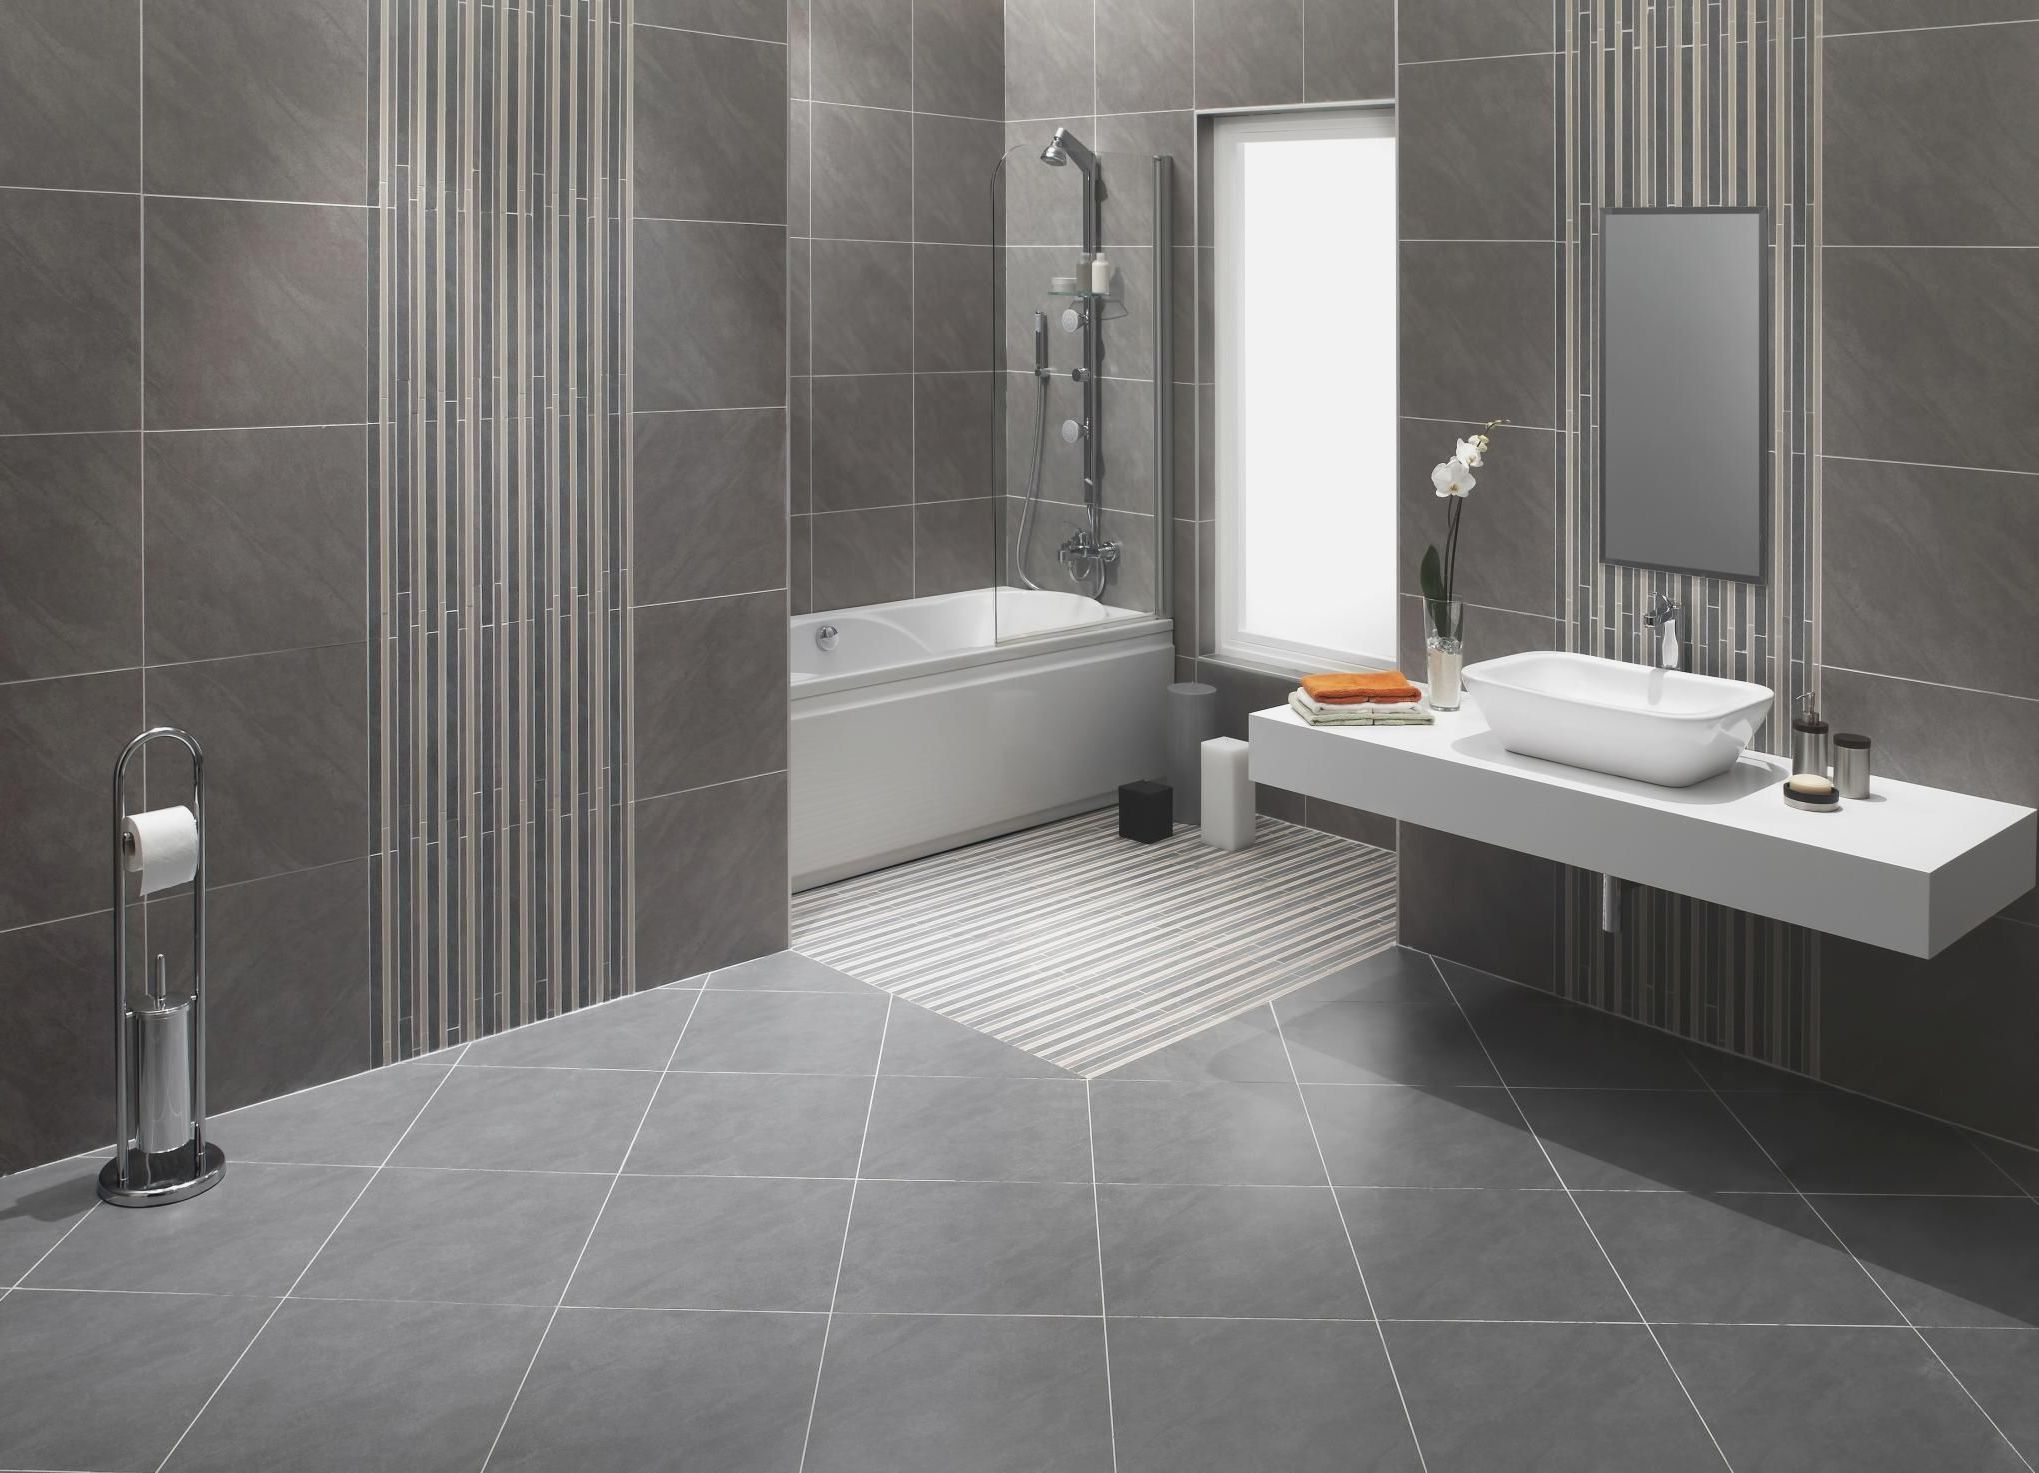 Trend Best Tile For Bathroom 42 For Your Tiles For Bathrooms With Tile Bathroom Ceramic Tile Bathrooms Best Bathroom Tiles